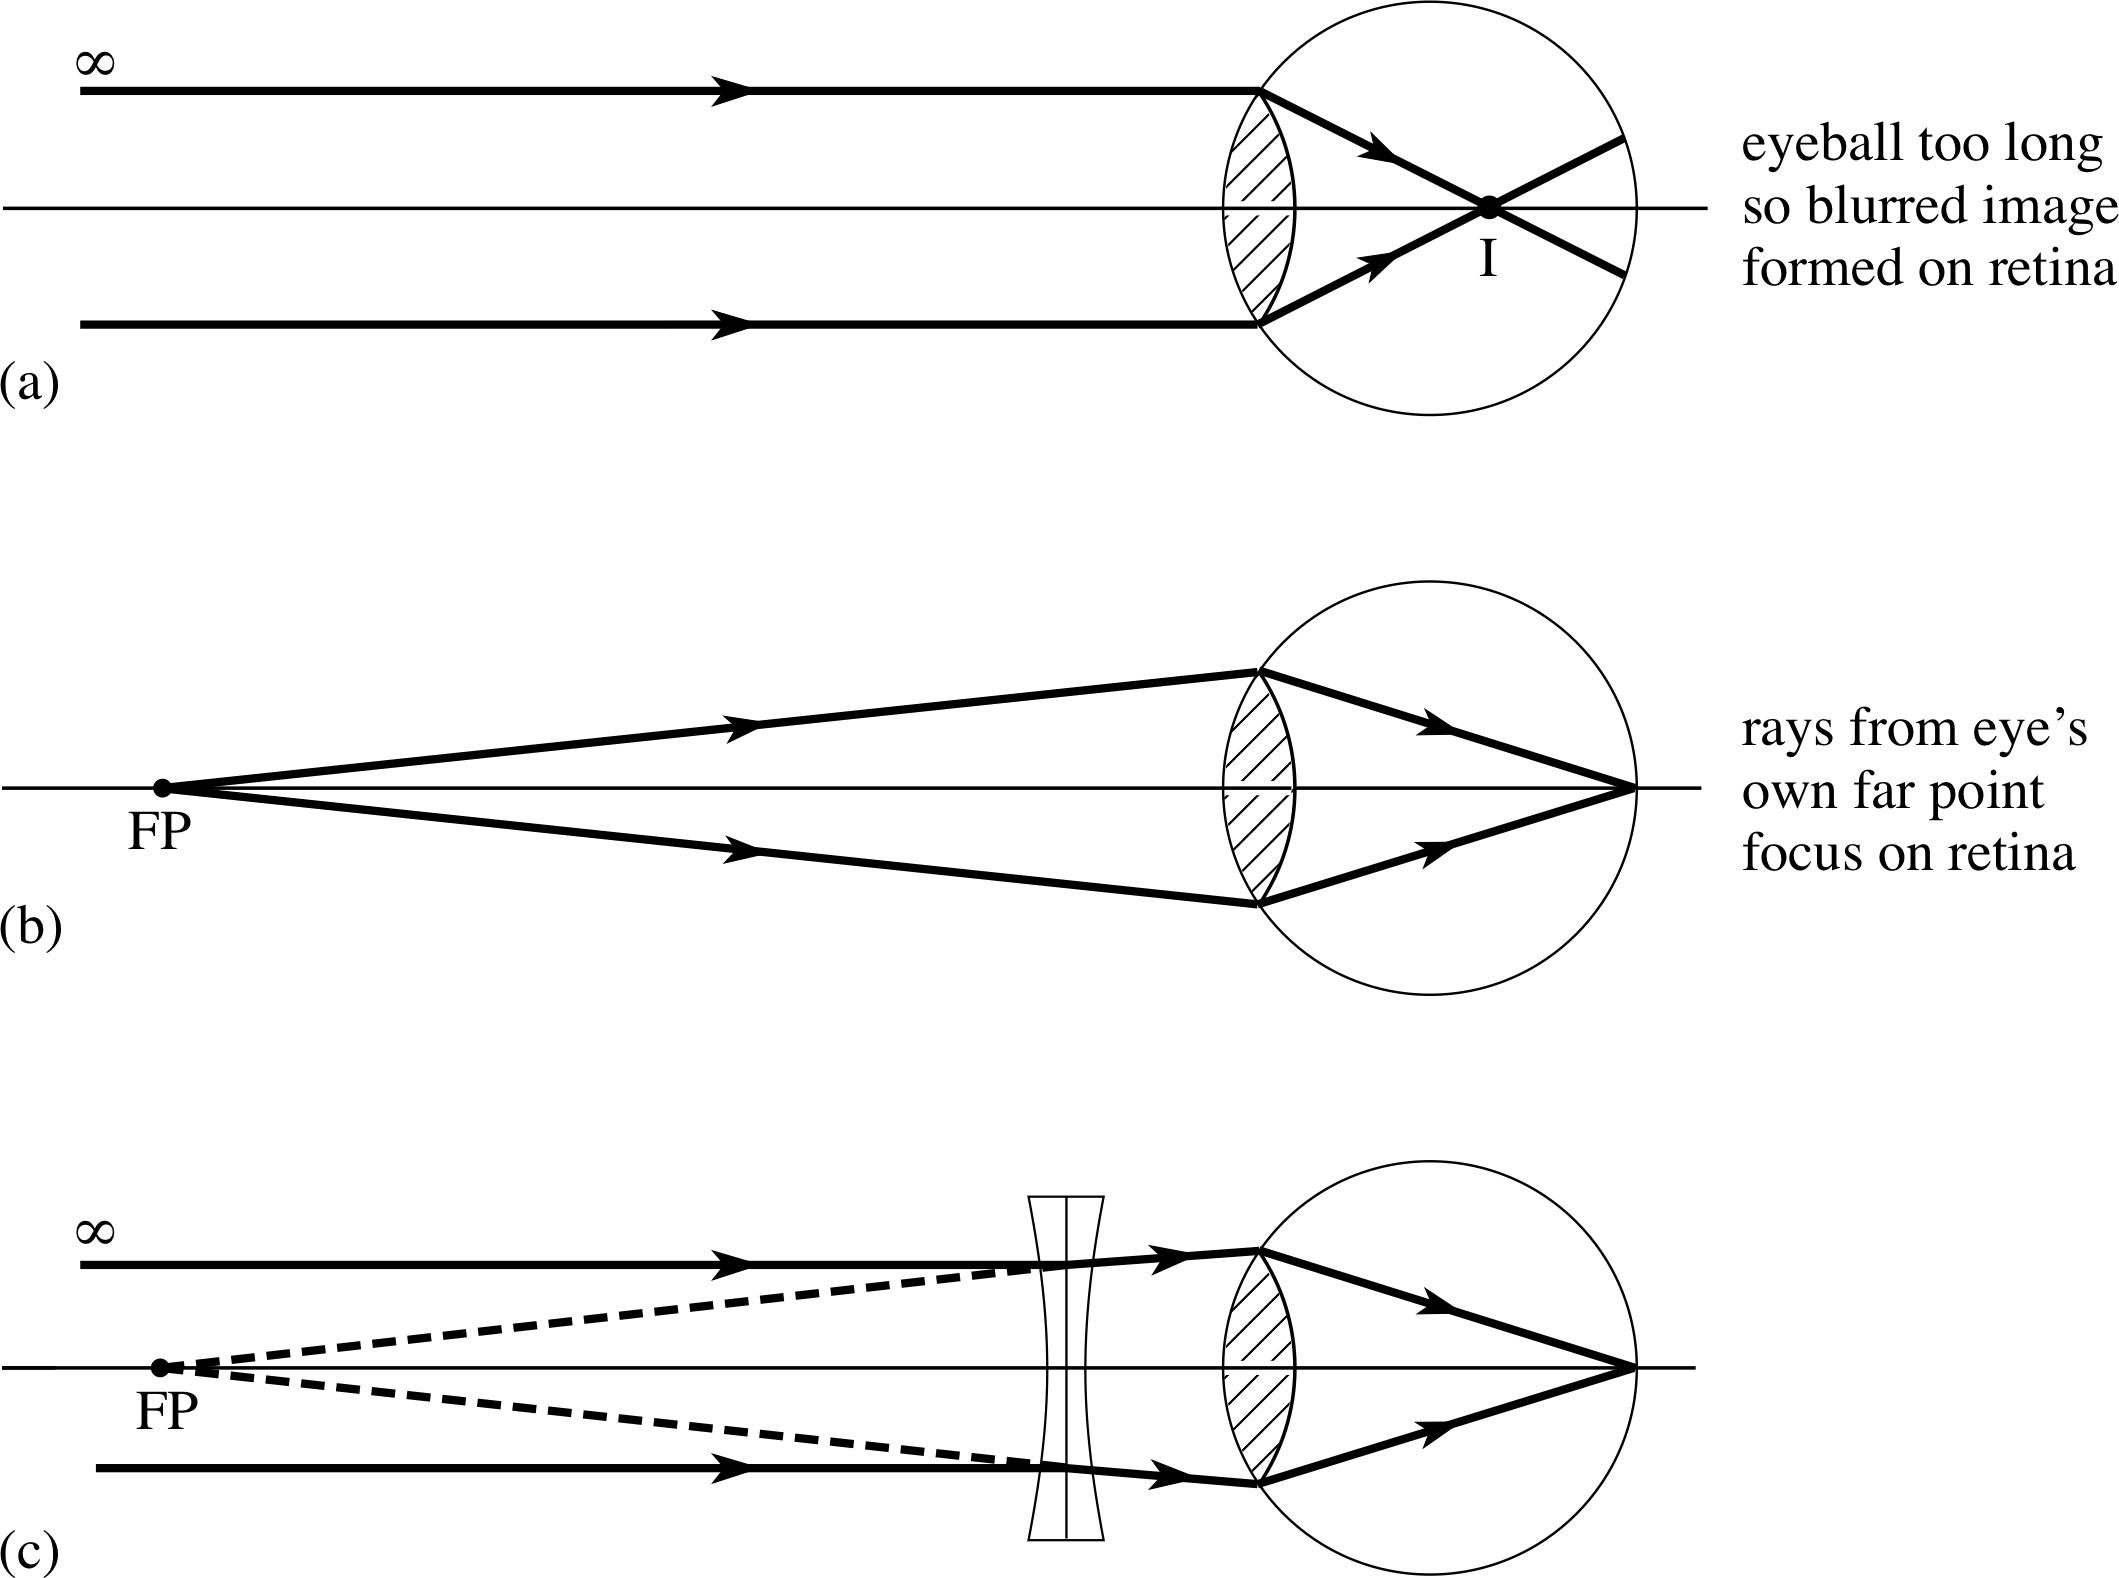 Pplato Flap Phys 64 Optical Instruments Fiber Optics Diagram Its Eprimer Module 9 Figure